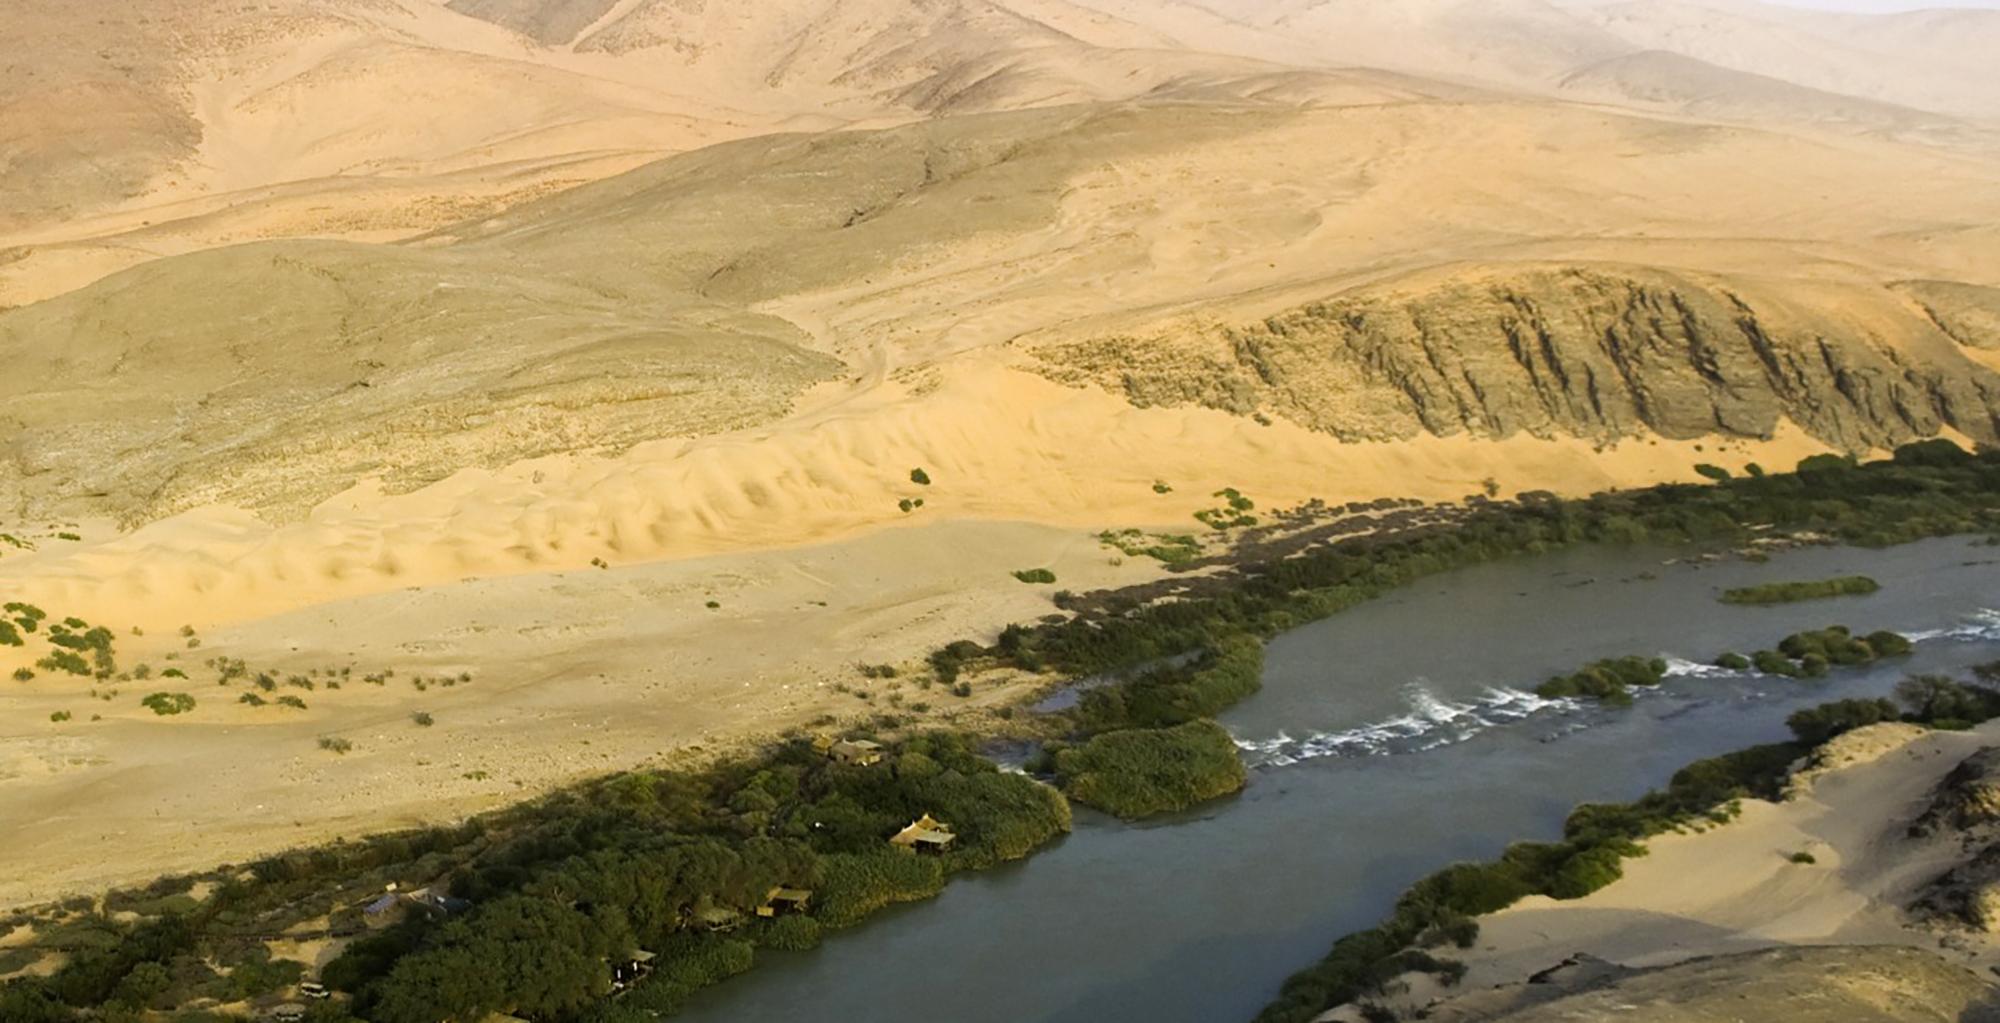 Namibia-Kaokoland-Landscape-Aerial